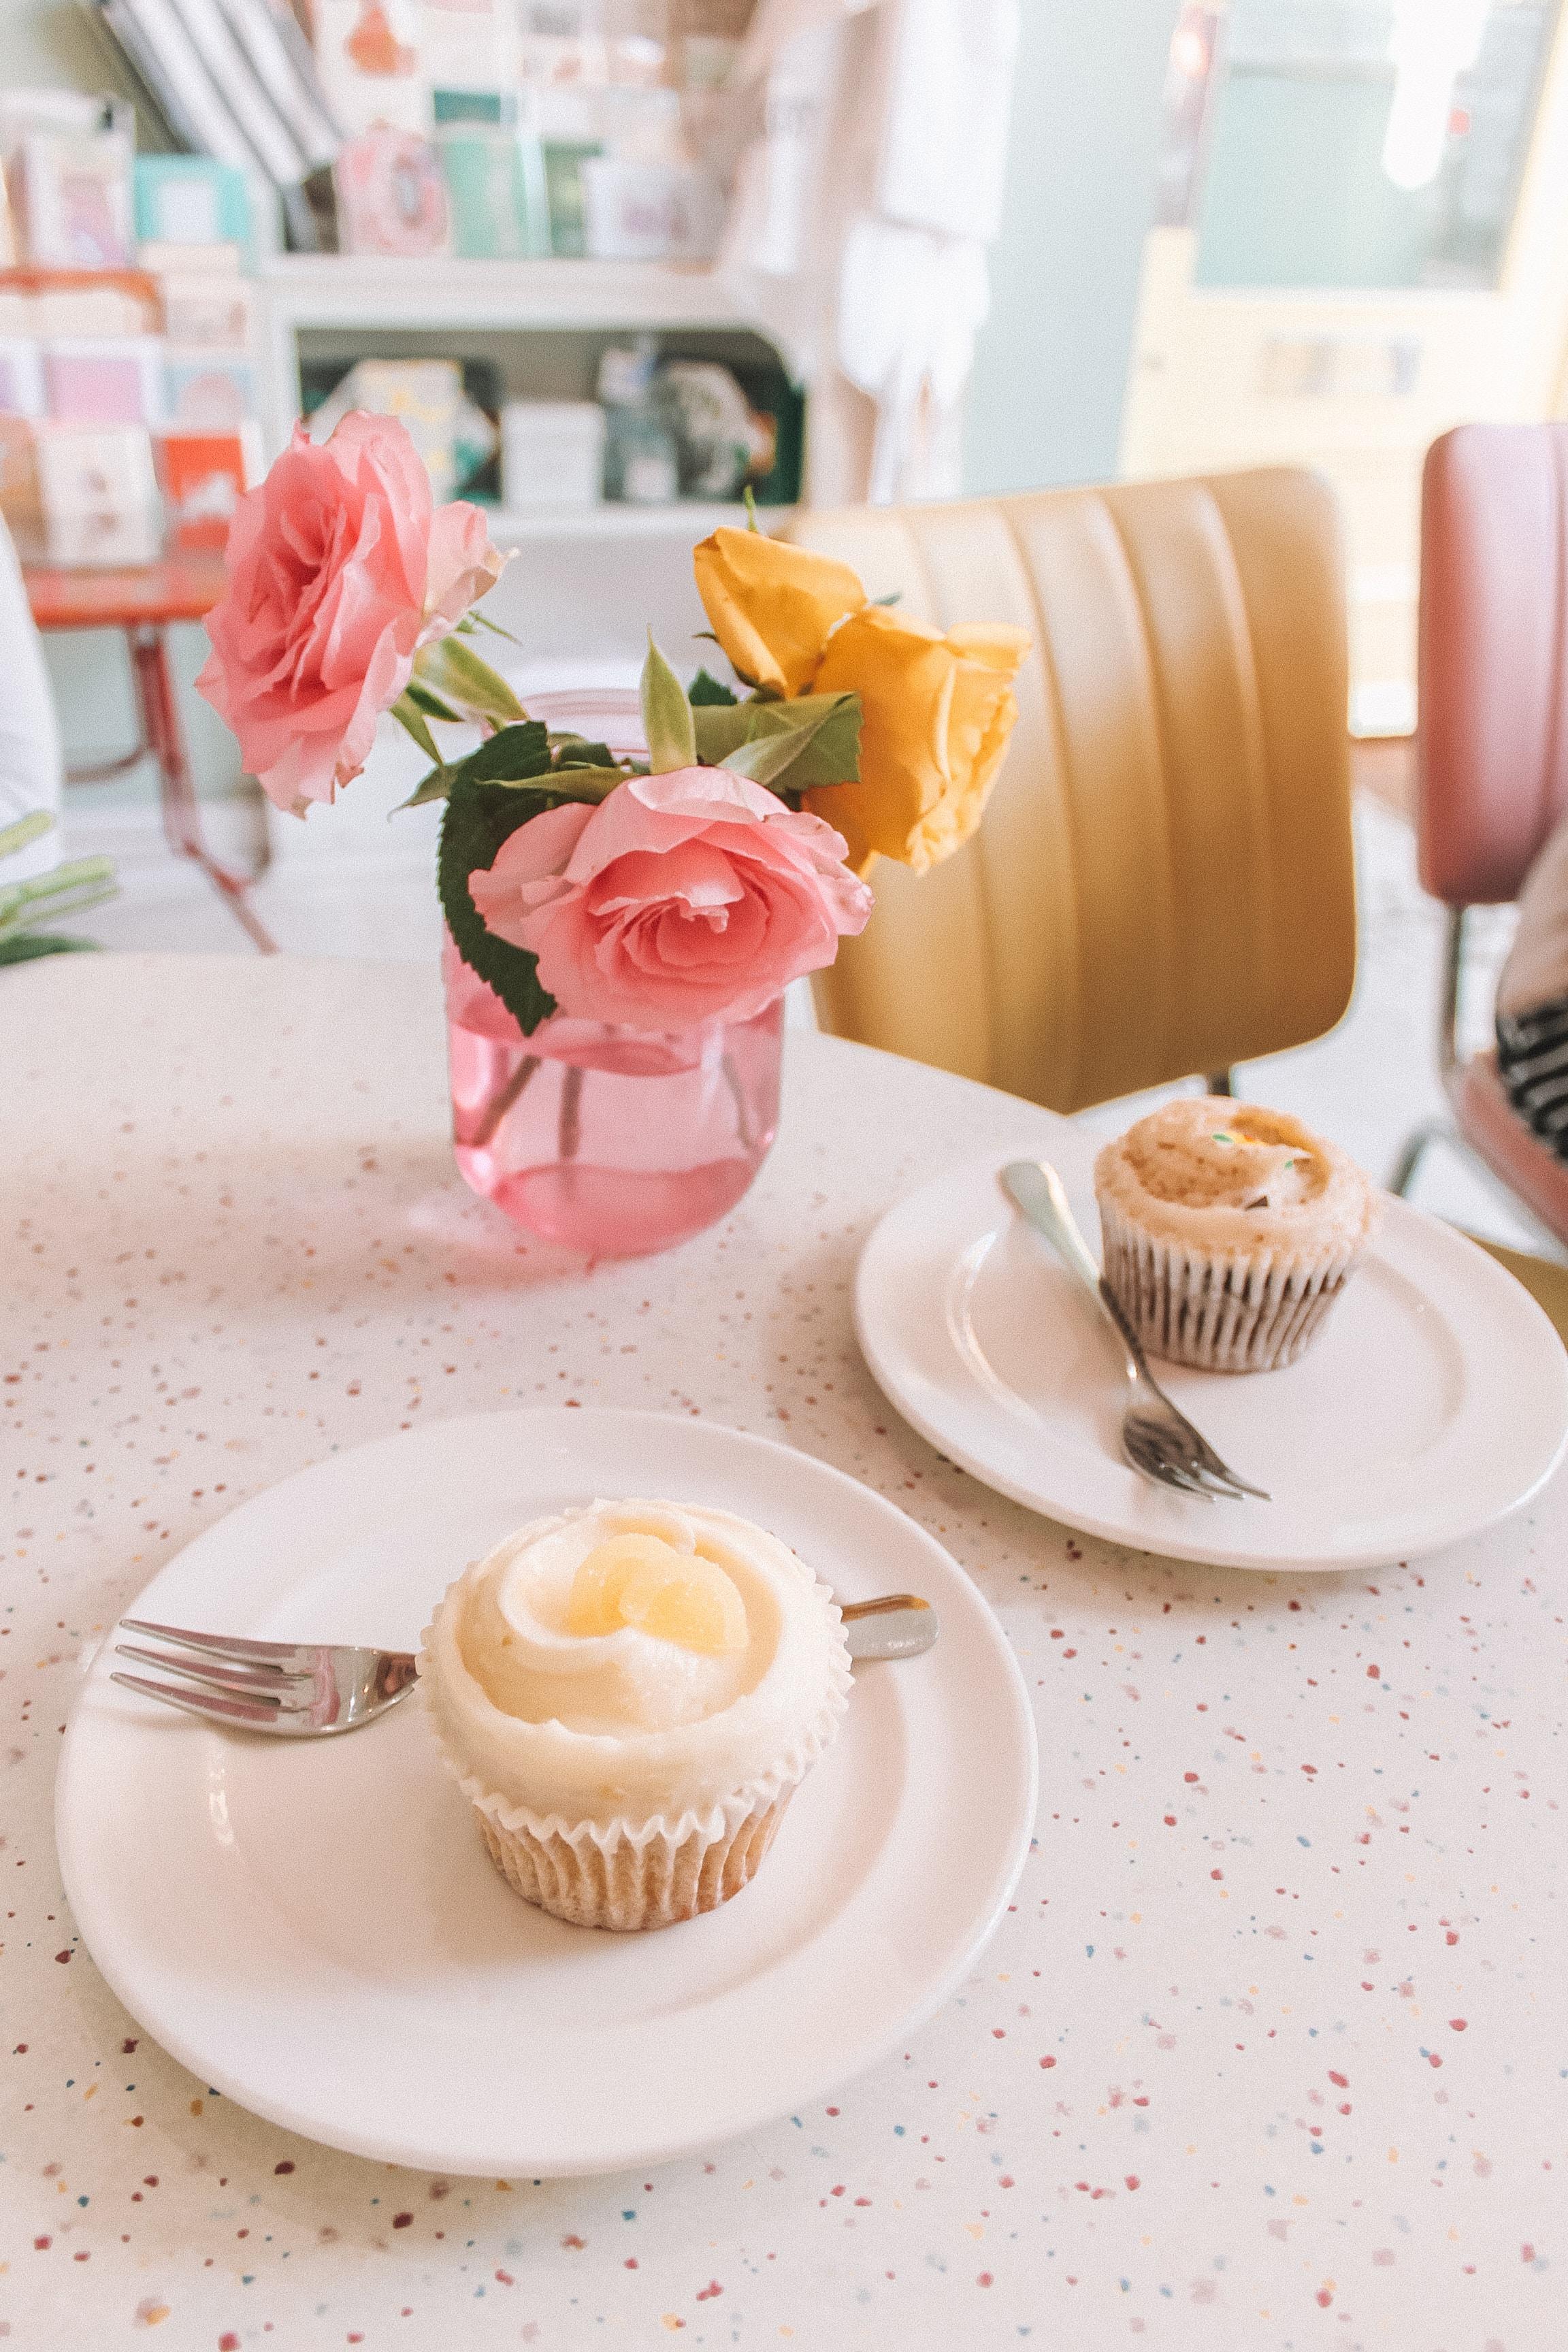 white and pink ceramic tea set